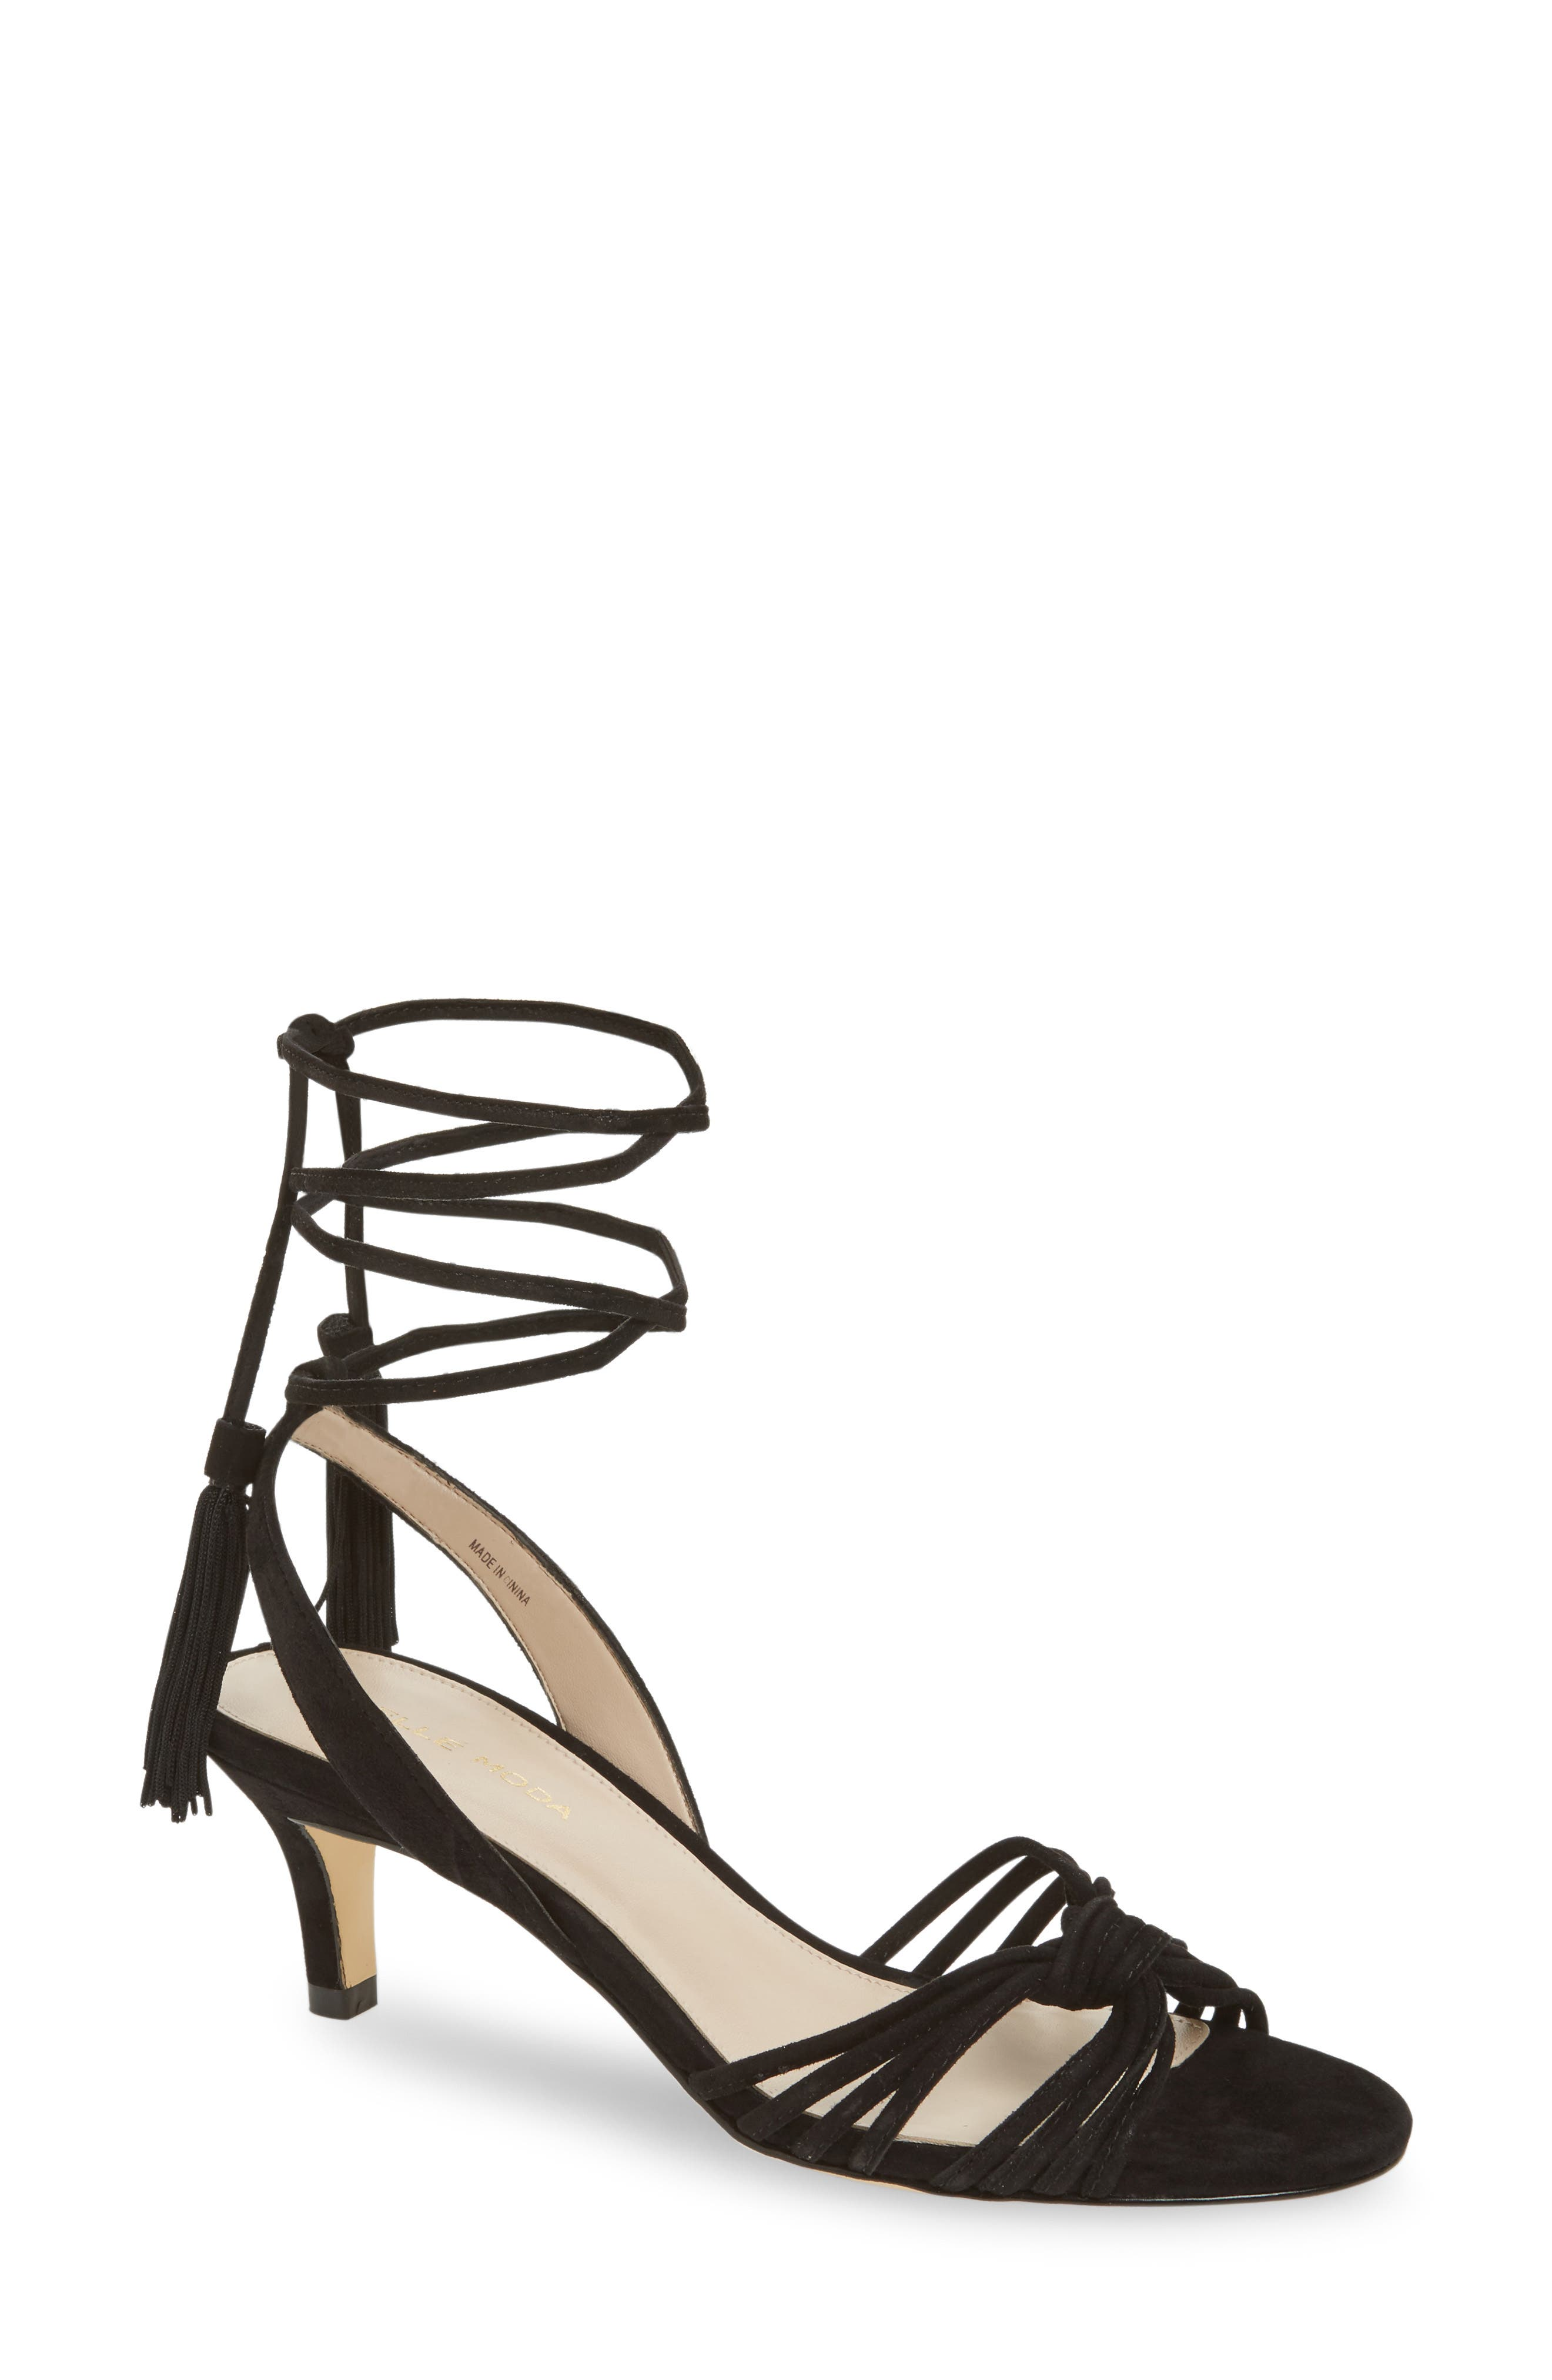 Benni Sandal,                         Main,                         color,